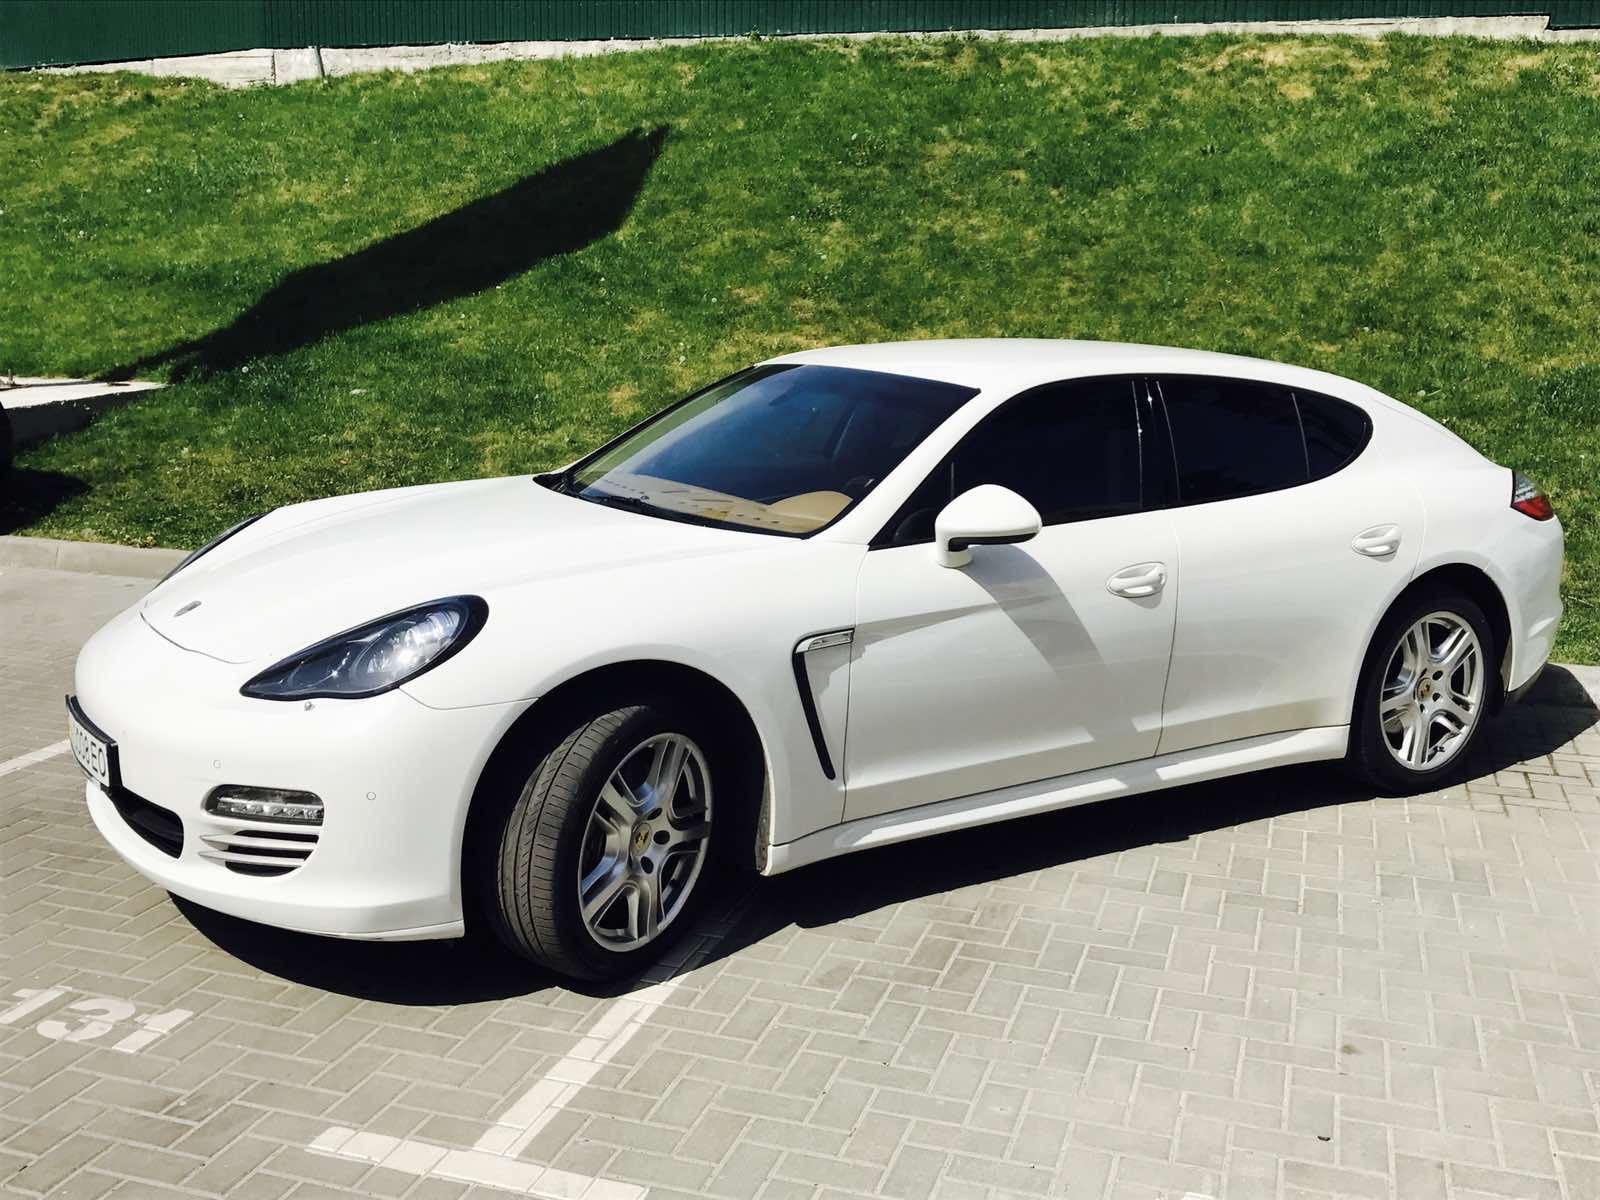 cabriolet, sports car rental in Kiev Porsche Panamera (1)